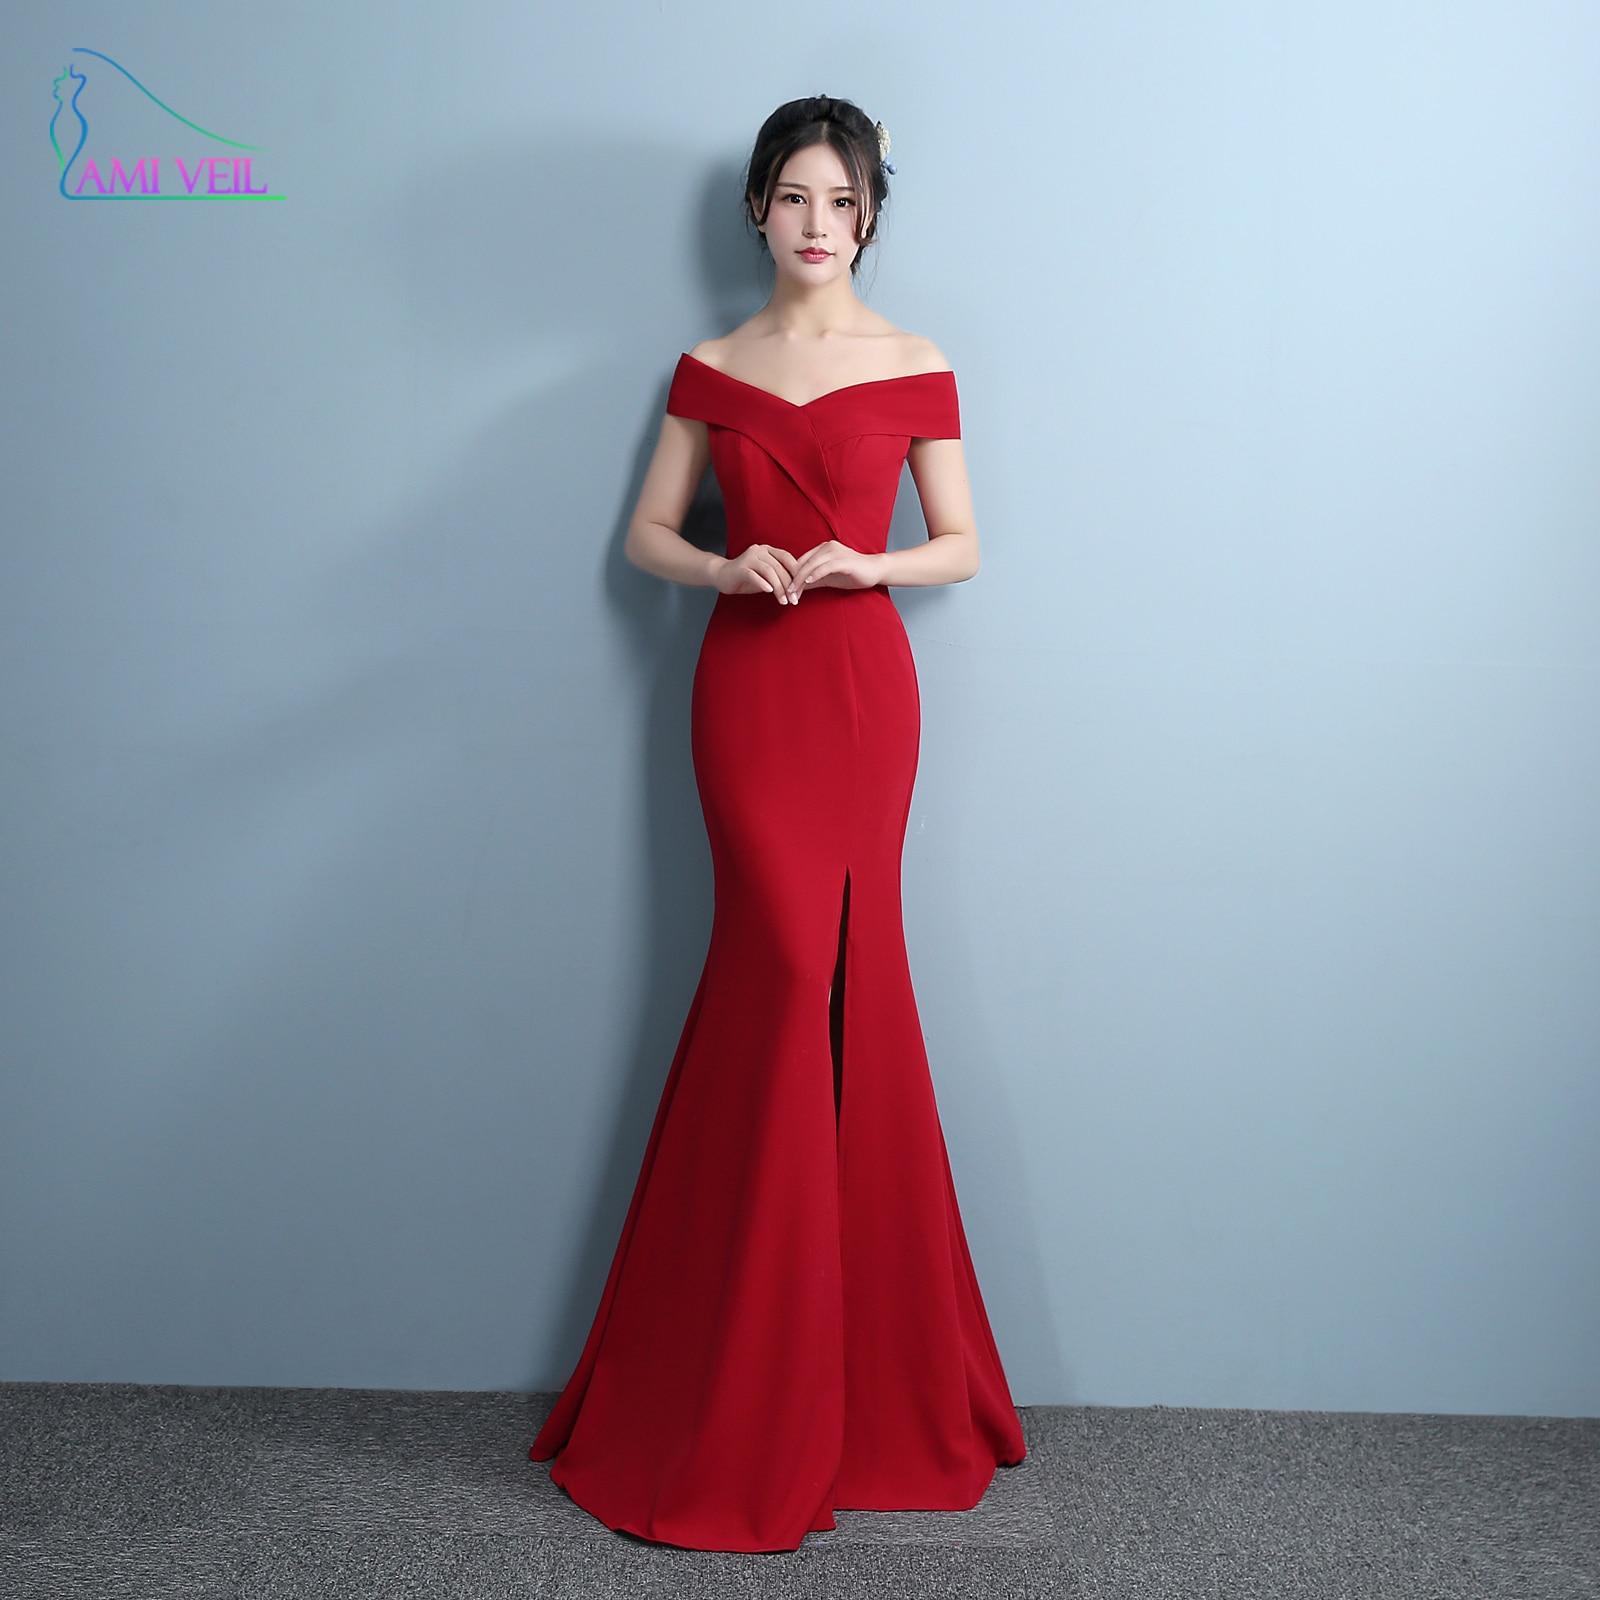 mermaid-evening-designer-vestidos-side-dividir-red-prom-dress-sexy-longos-vestidos-de-noite-v-neck-imported-vestido-de-festa-vestidos-de-gala-gq827